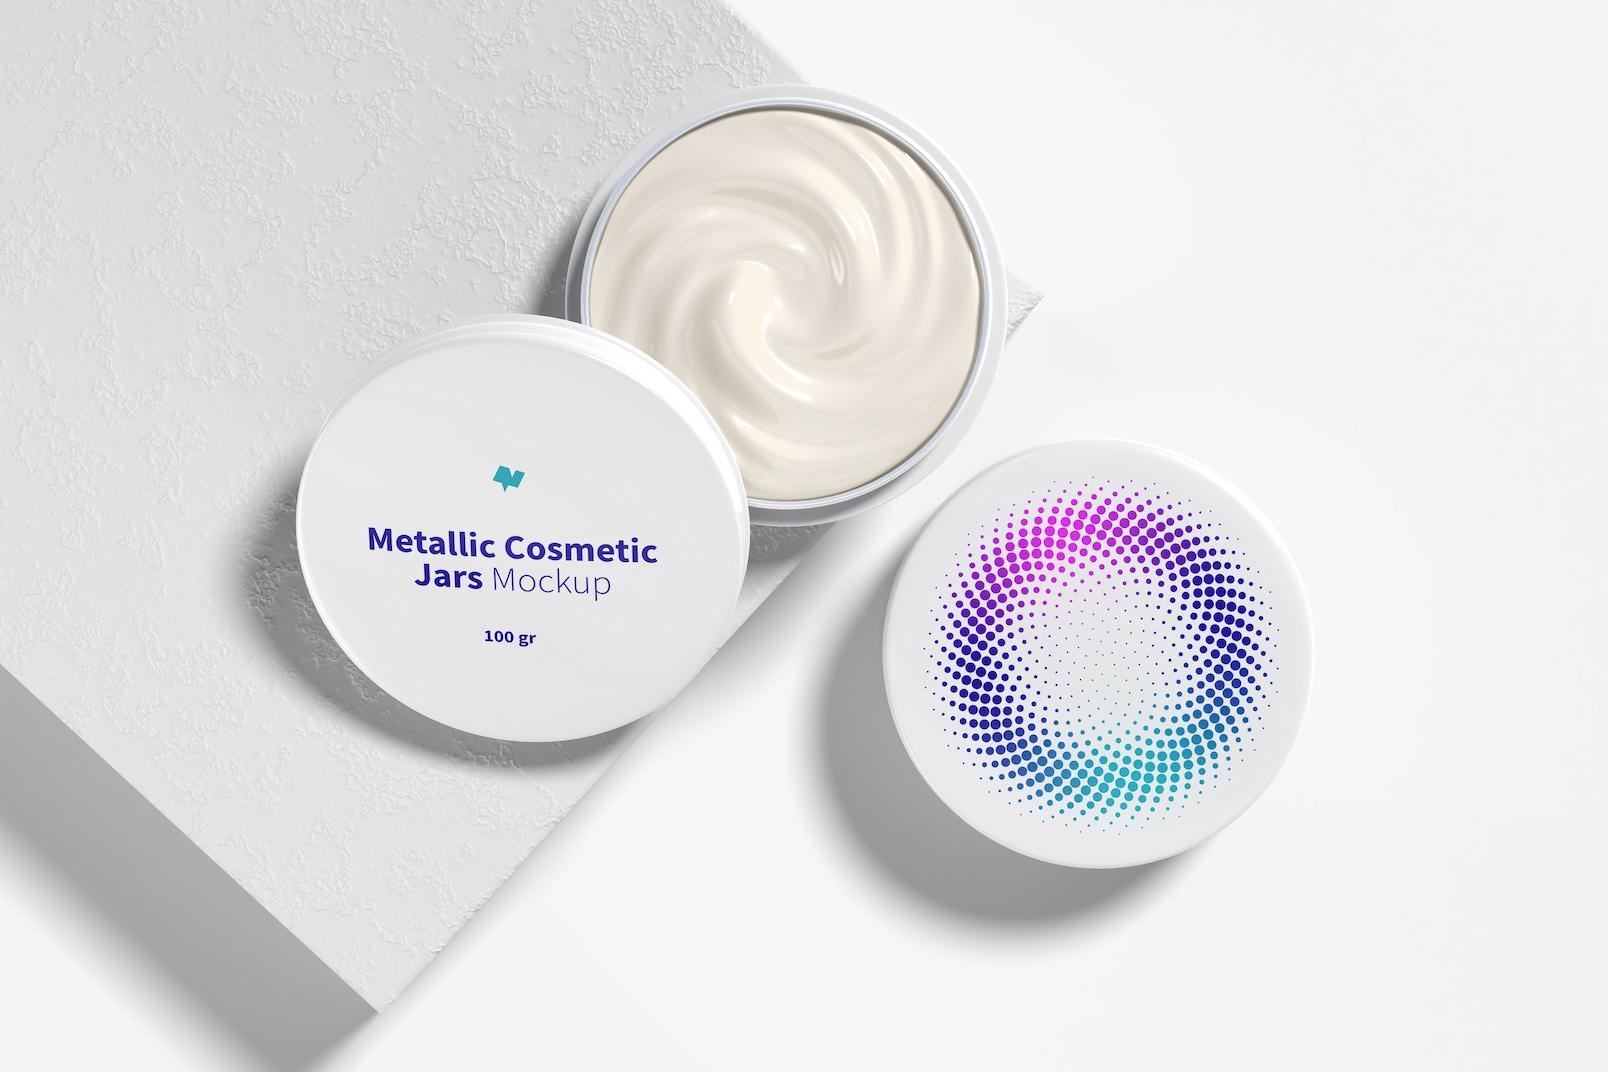 100 g Metallic Cosmetic Jars Mockup, Opened and Closed